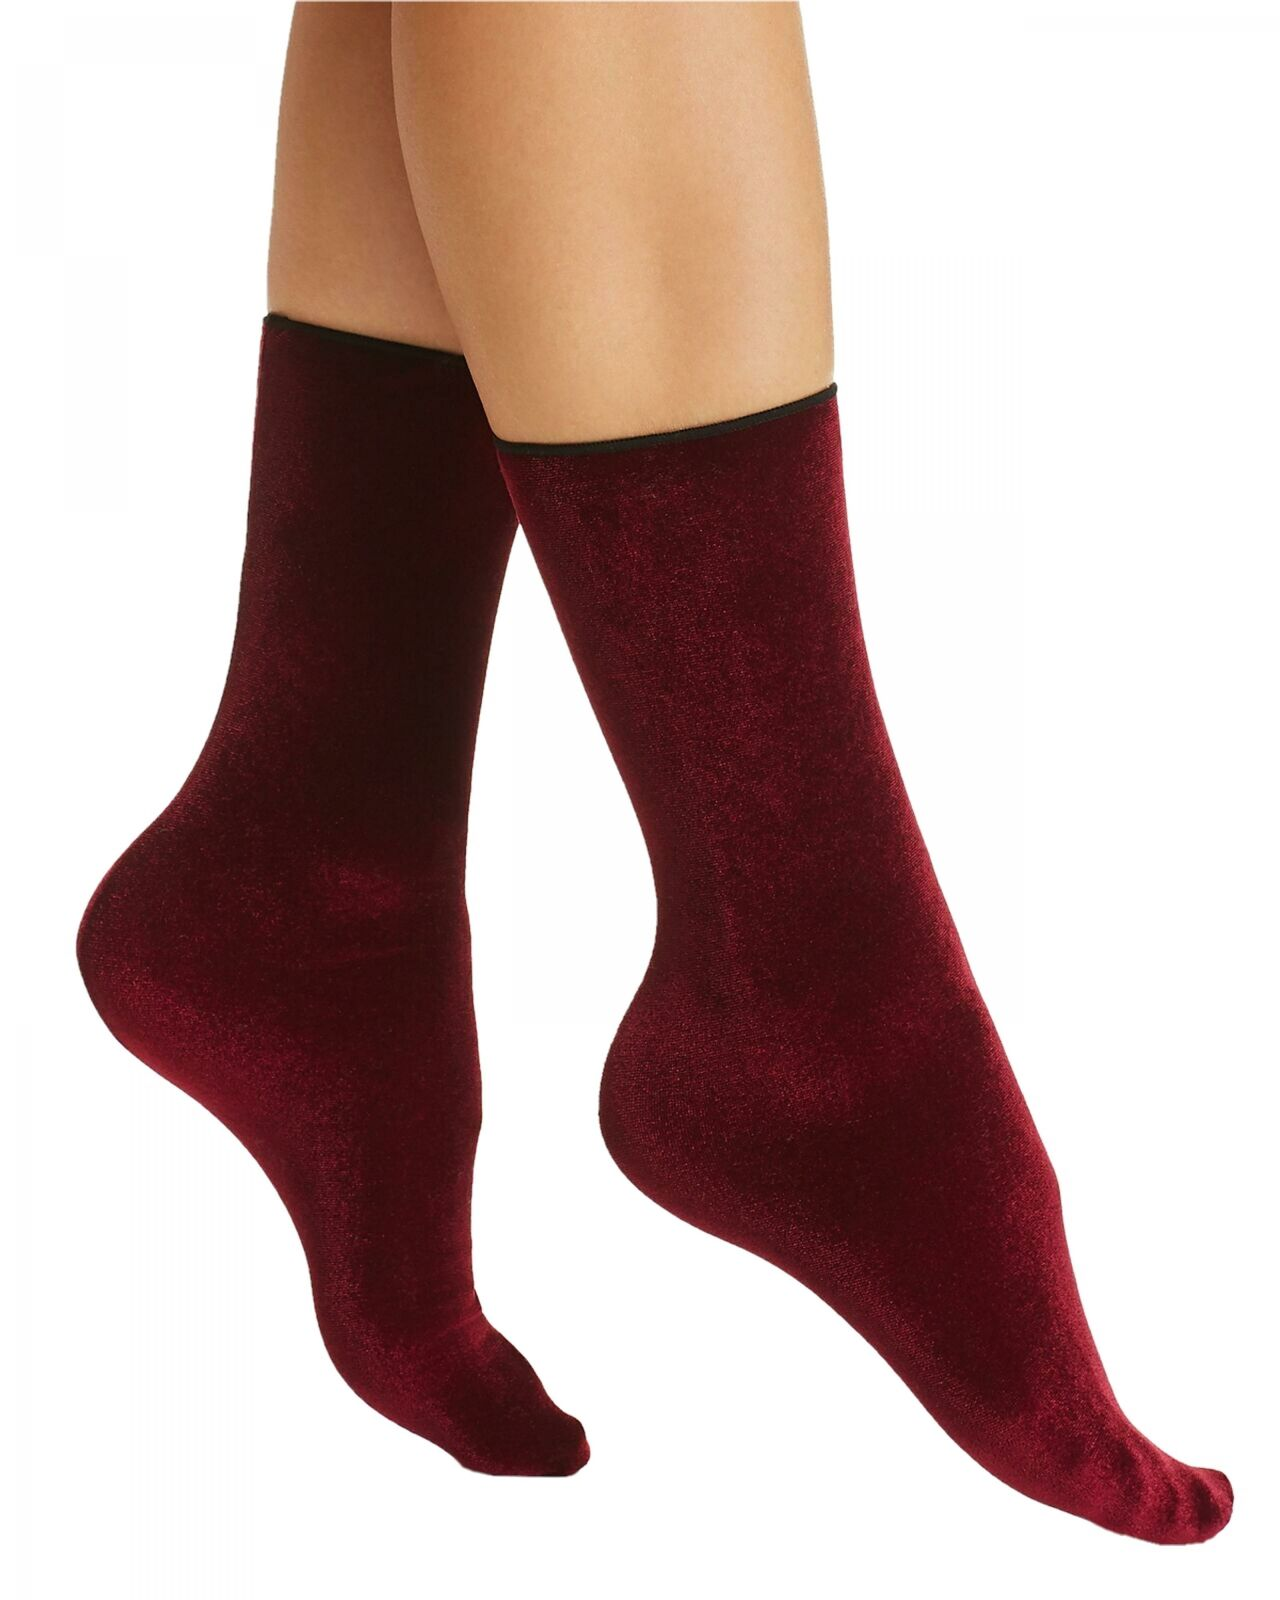 Currant HUE Womens Velvet Crew Socks Burgundy .ONE SIZE.IDEAL Christmas PRESENT